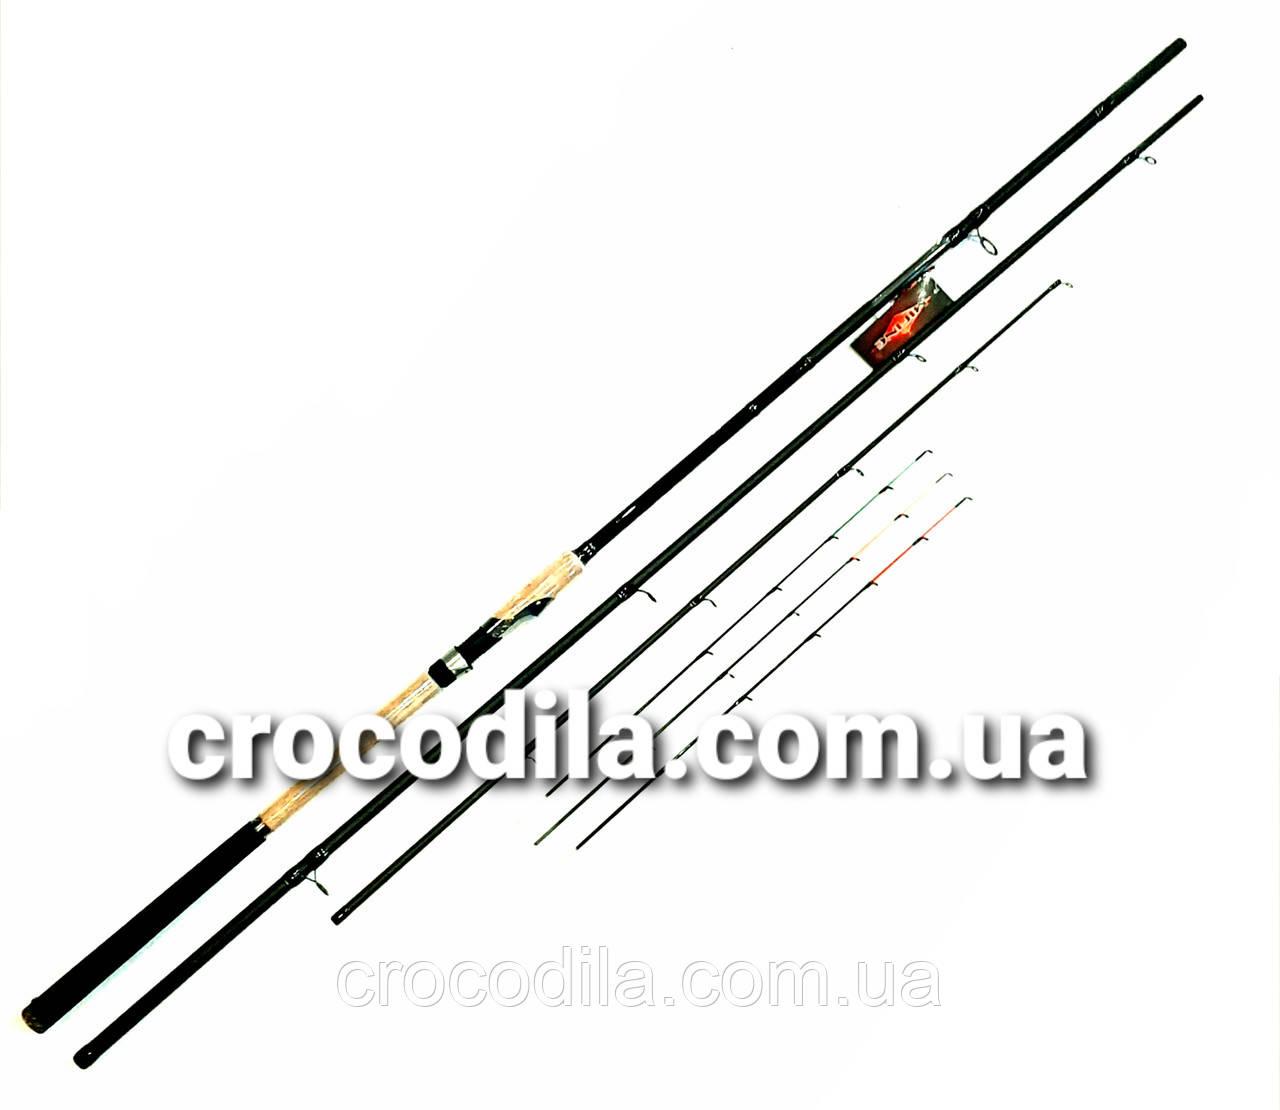 Карбоновое фидерное удилище Mifine West Star Feeder Game 3.3 м до 80-180 грамм